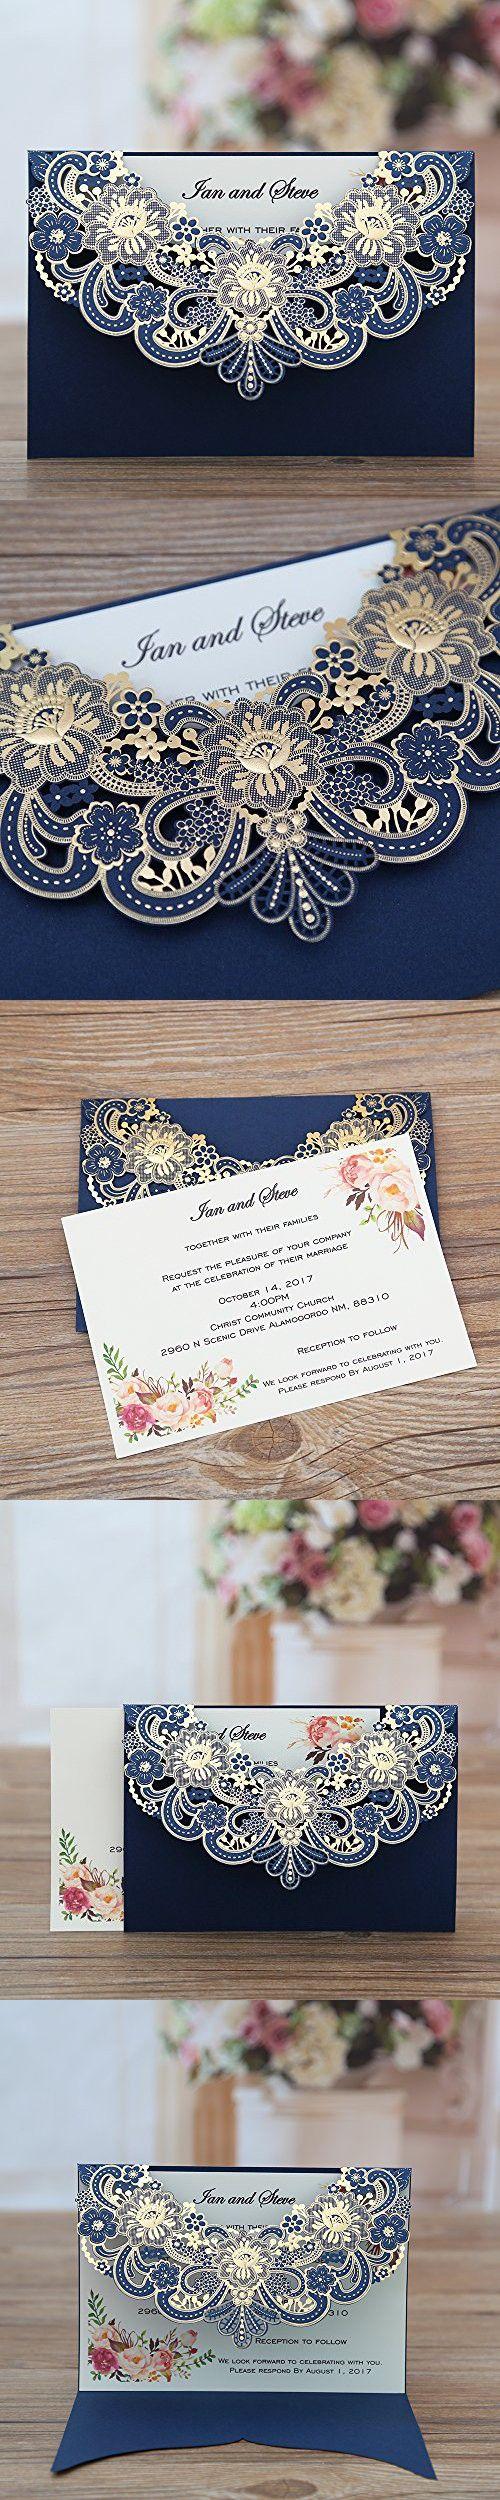 400 Best Wedding Invitations Images By Best Alexa On Pinterest